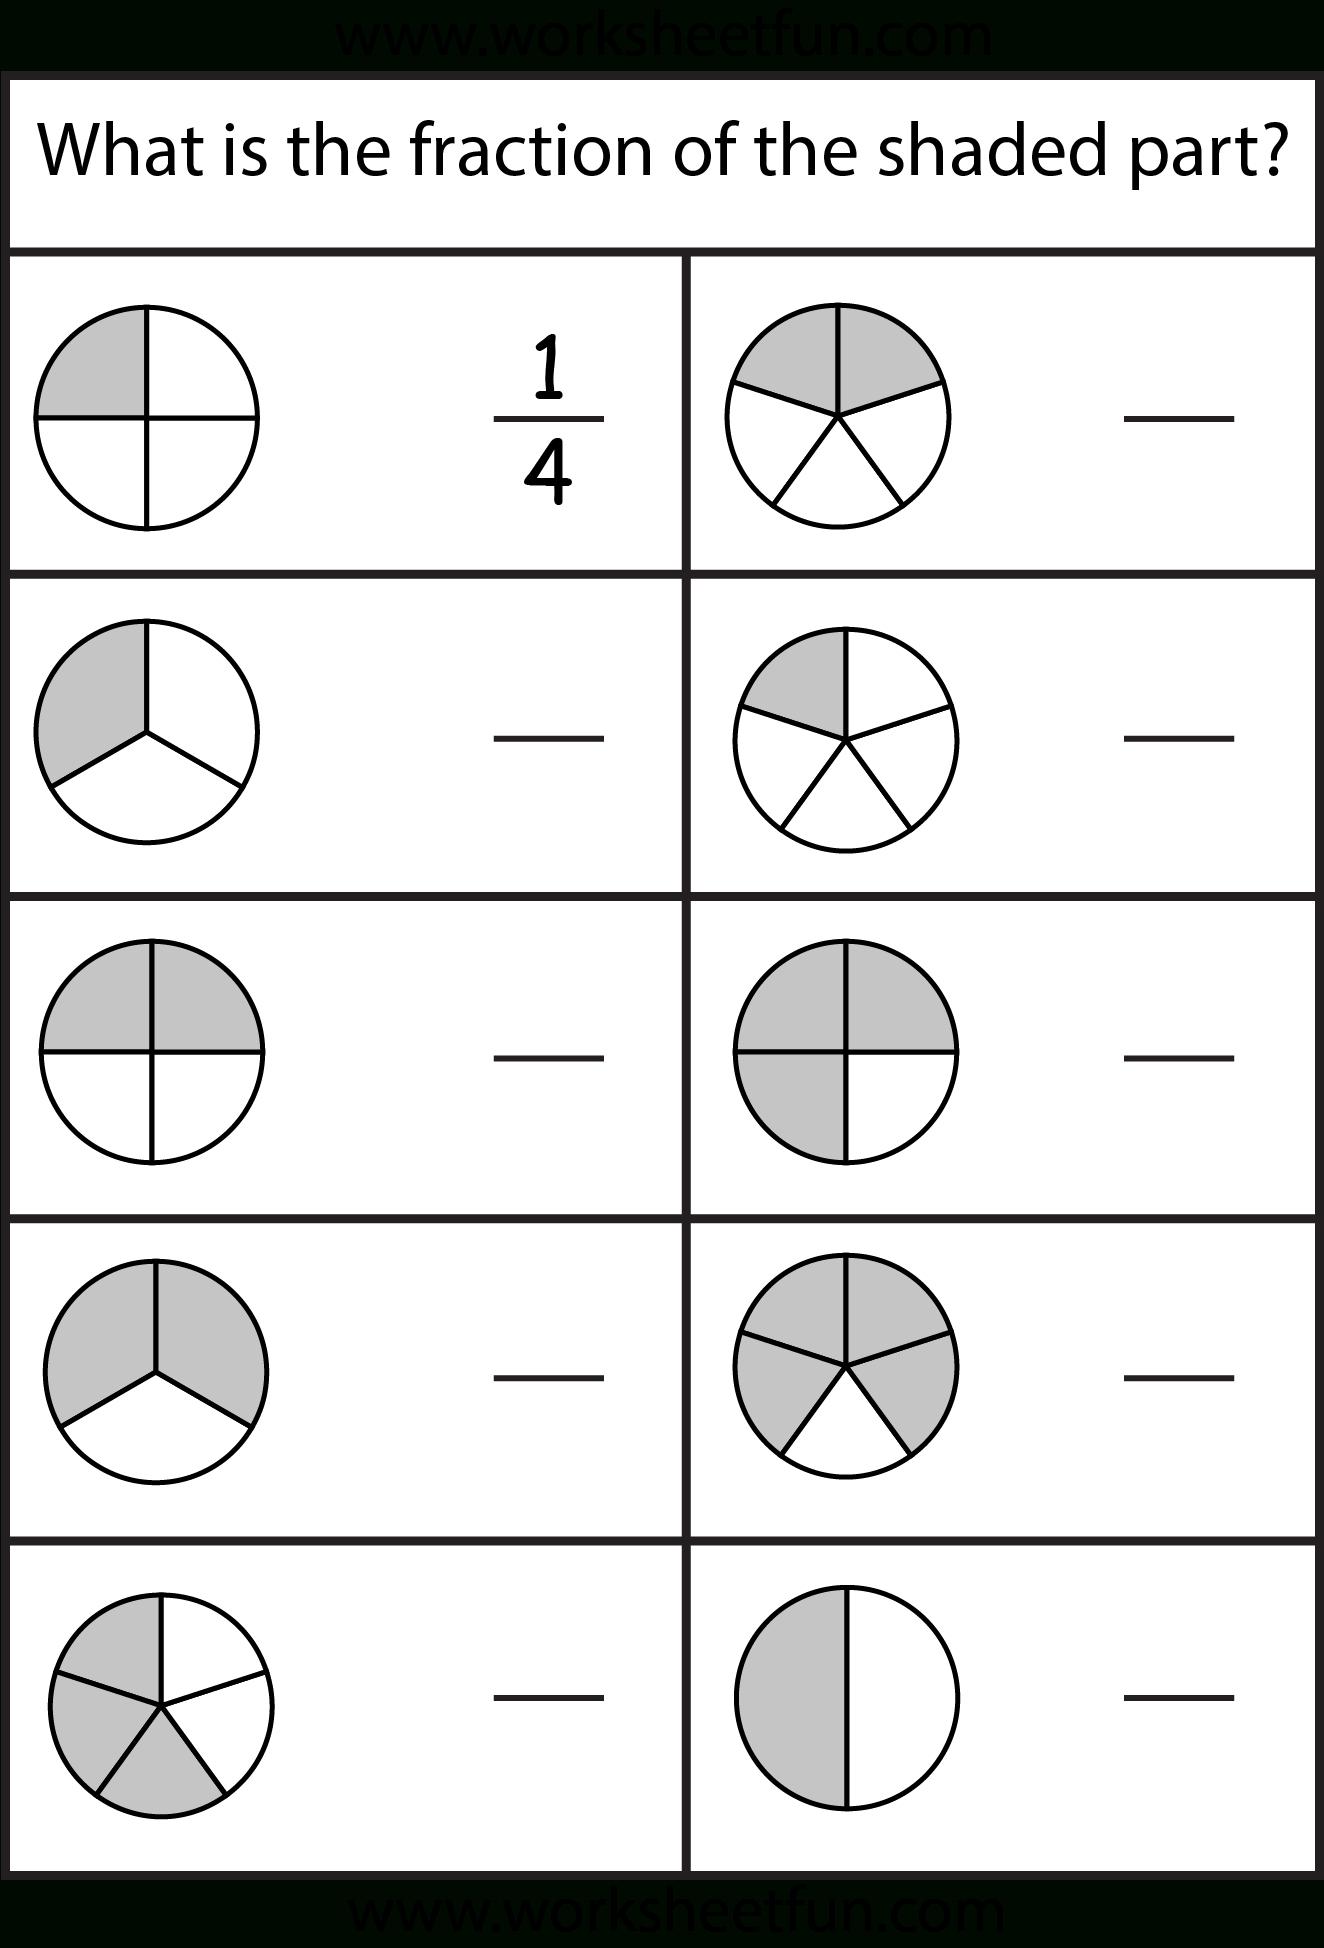 Equivalent Fractions Worksheet / Free Printable Worksheets - Free Printable Fraction Worksheets